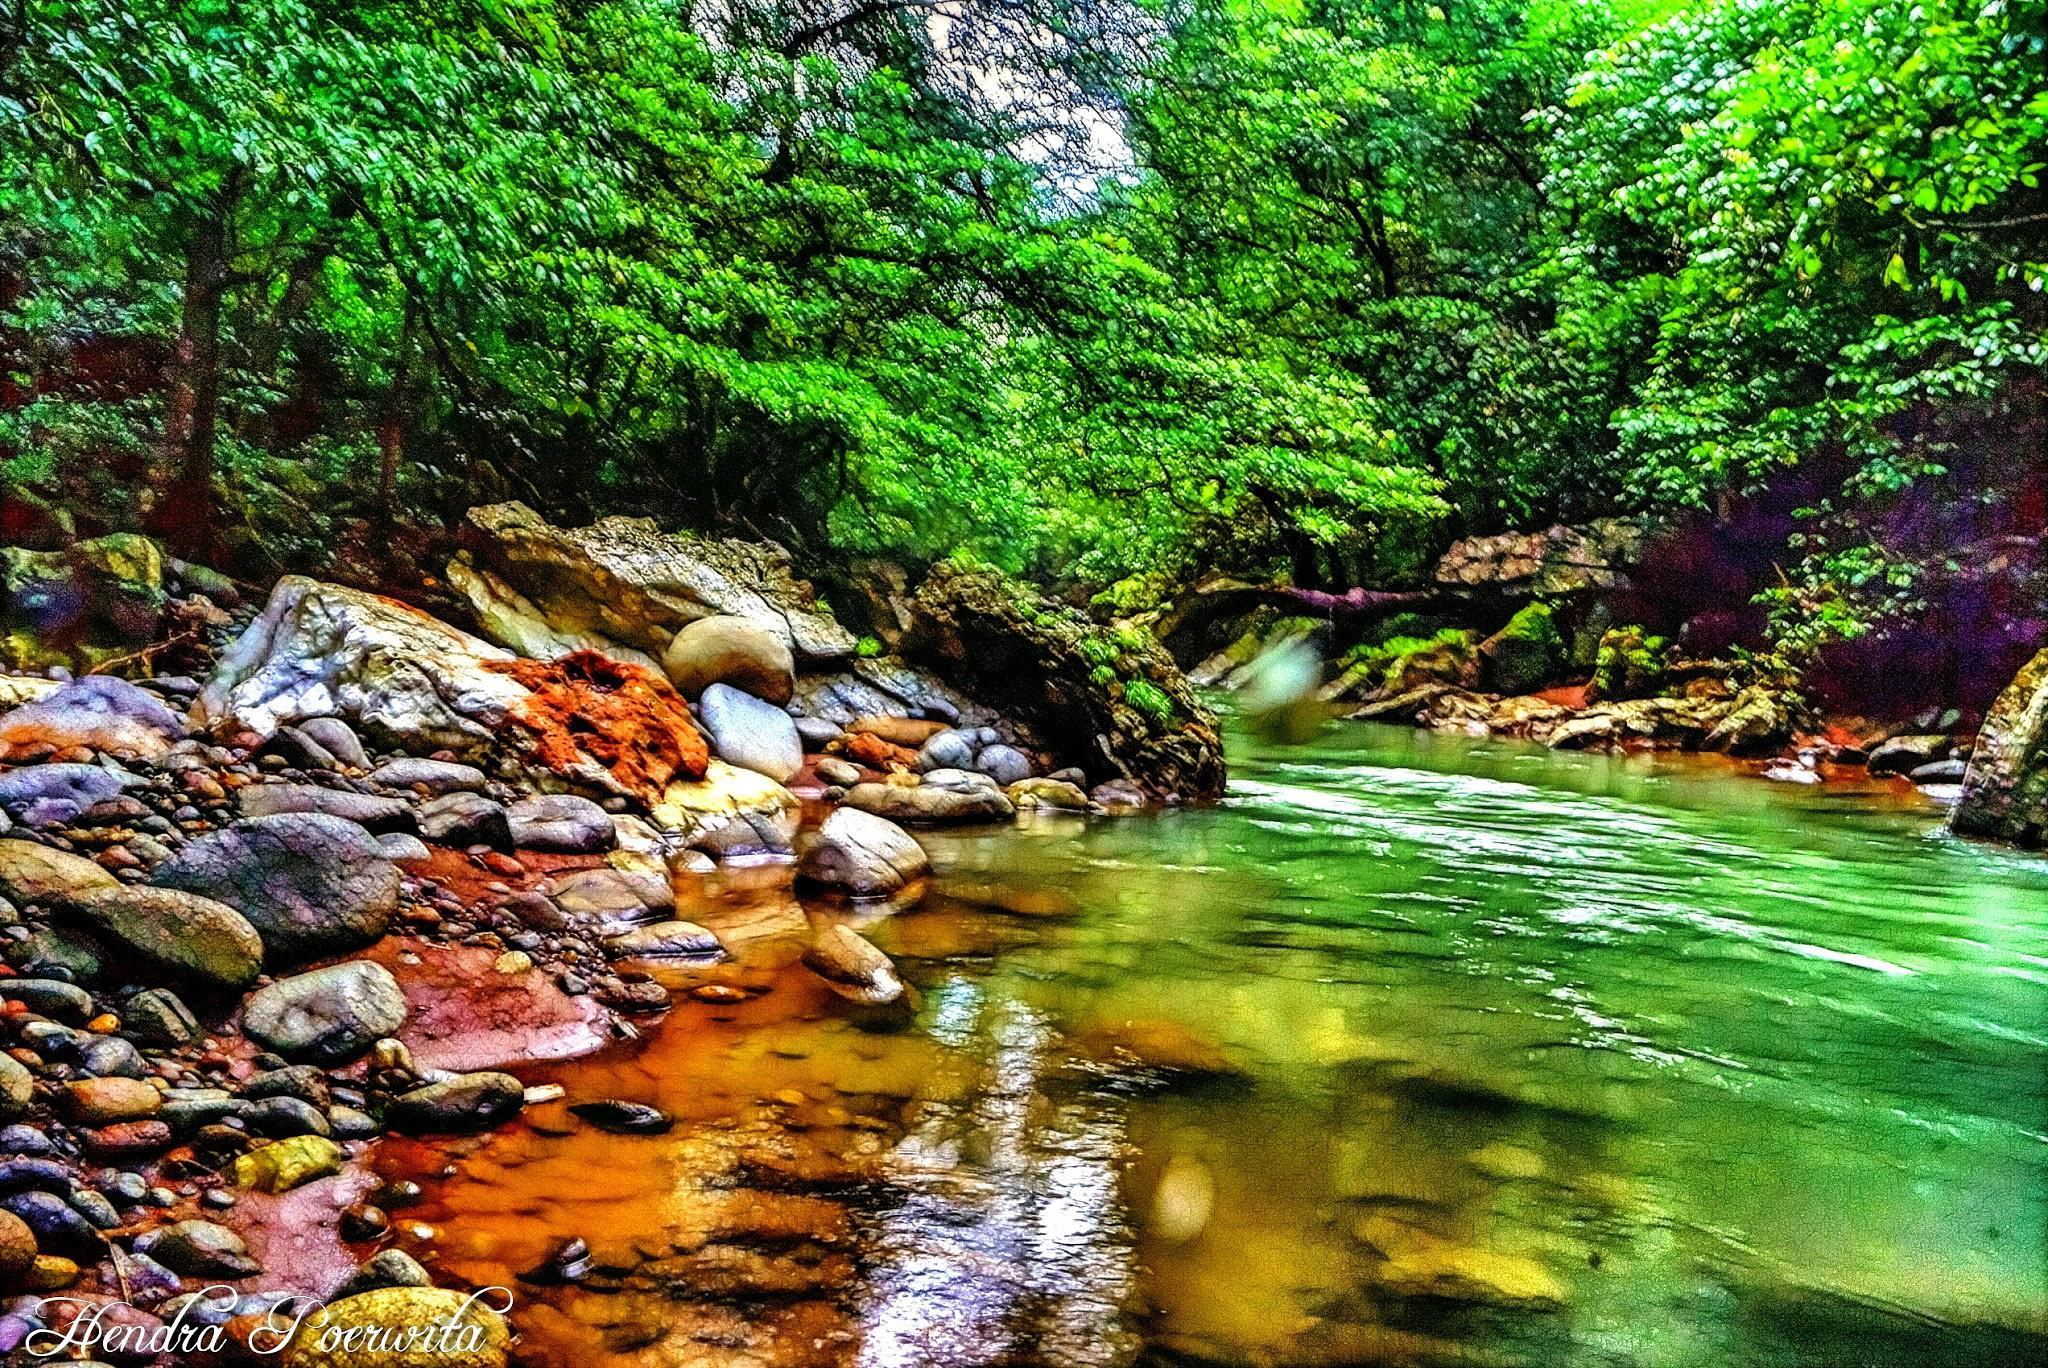 FRACTAL RIVER by hendra.poerwita